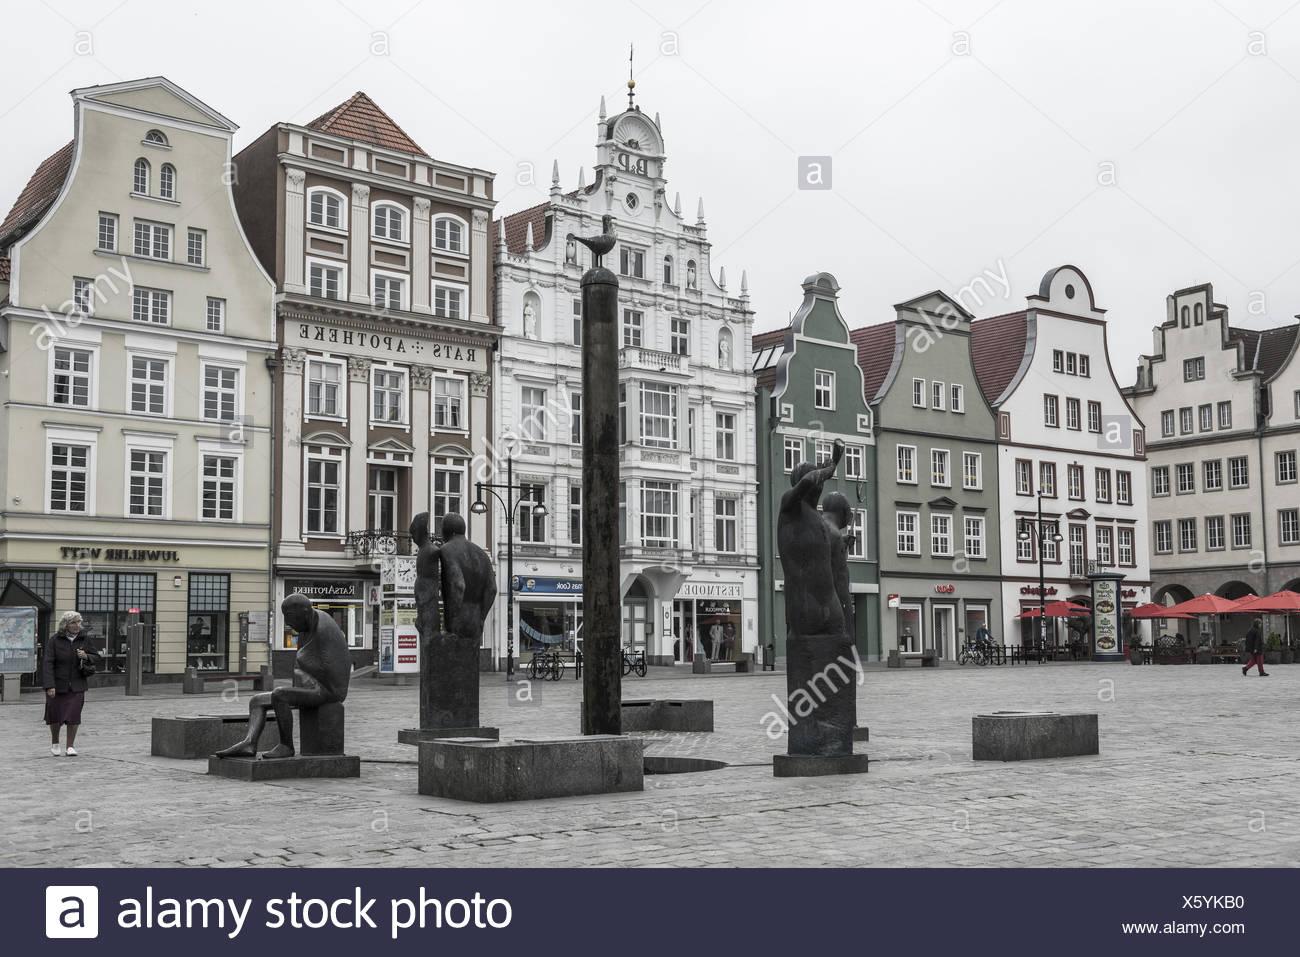 New market, Rostock Stock Photo